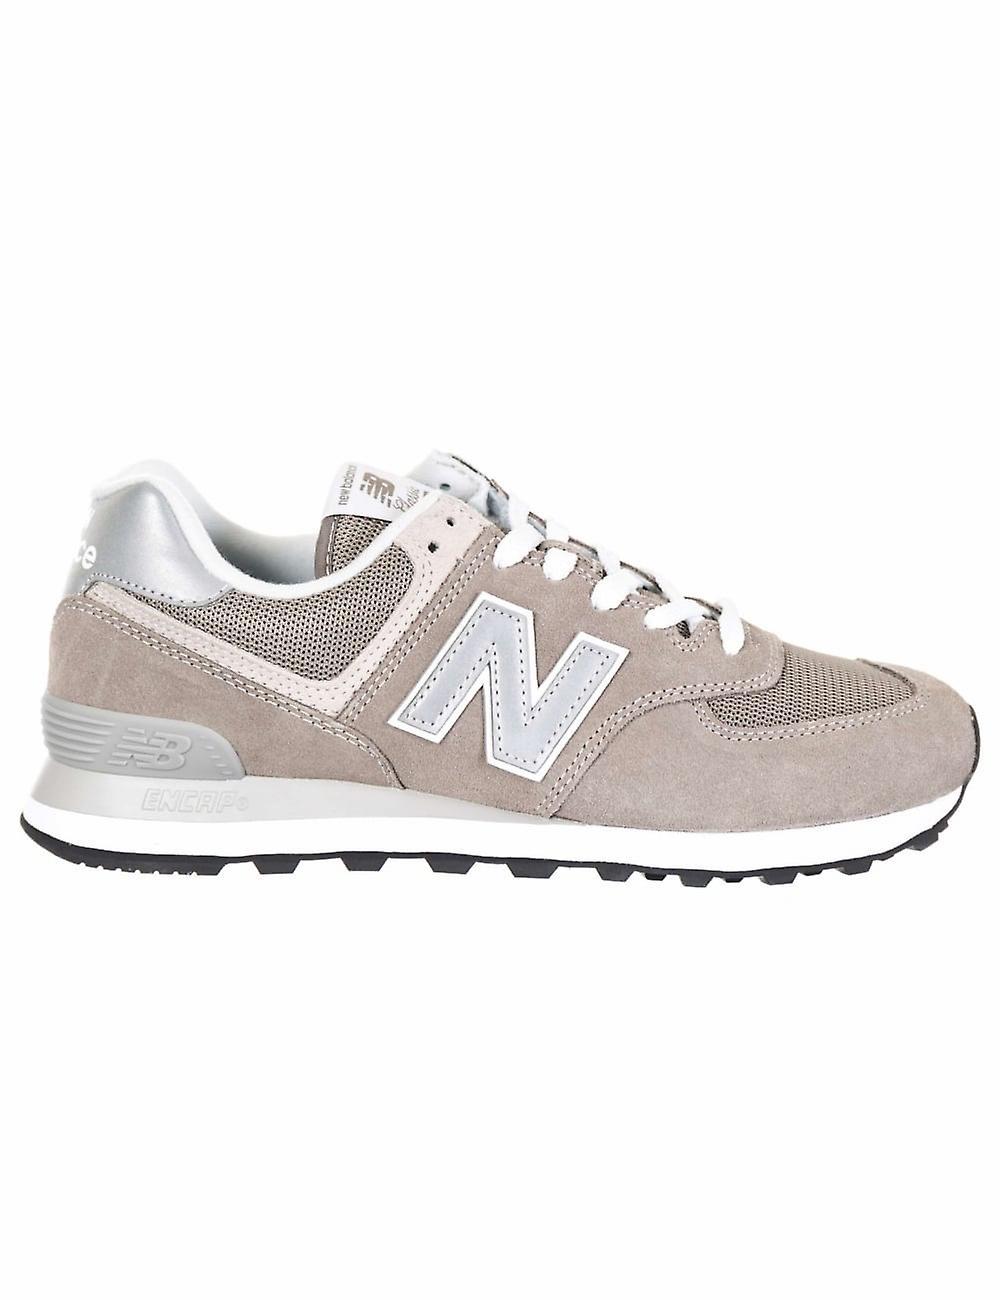 New Balance Ml574egg Shoes - Grey